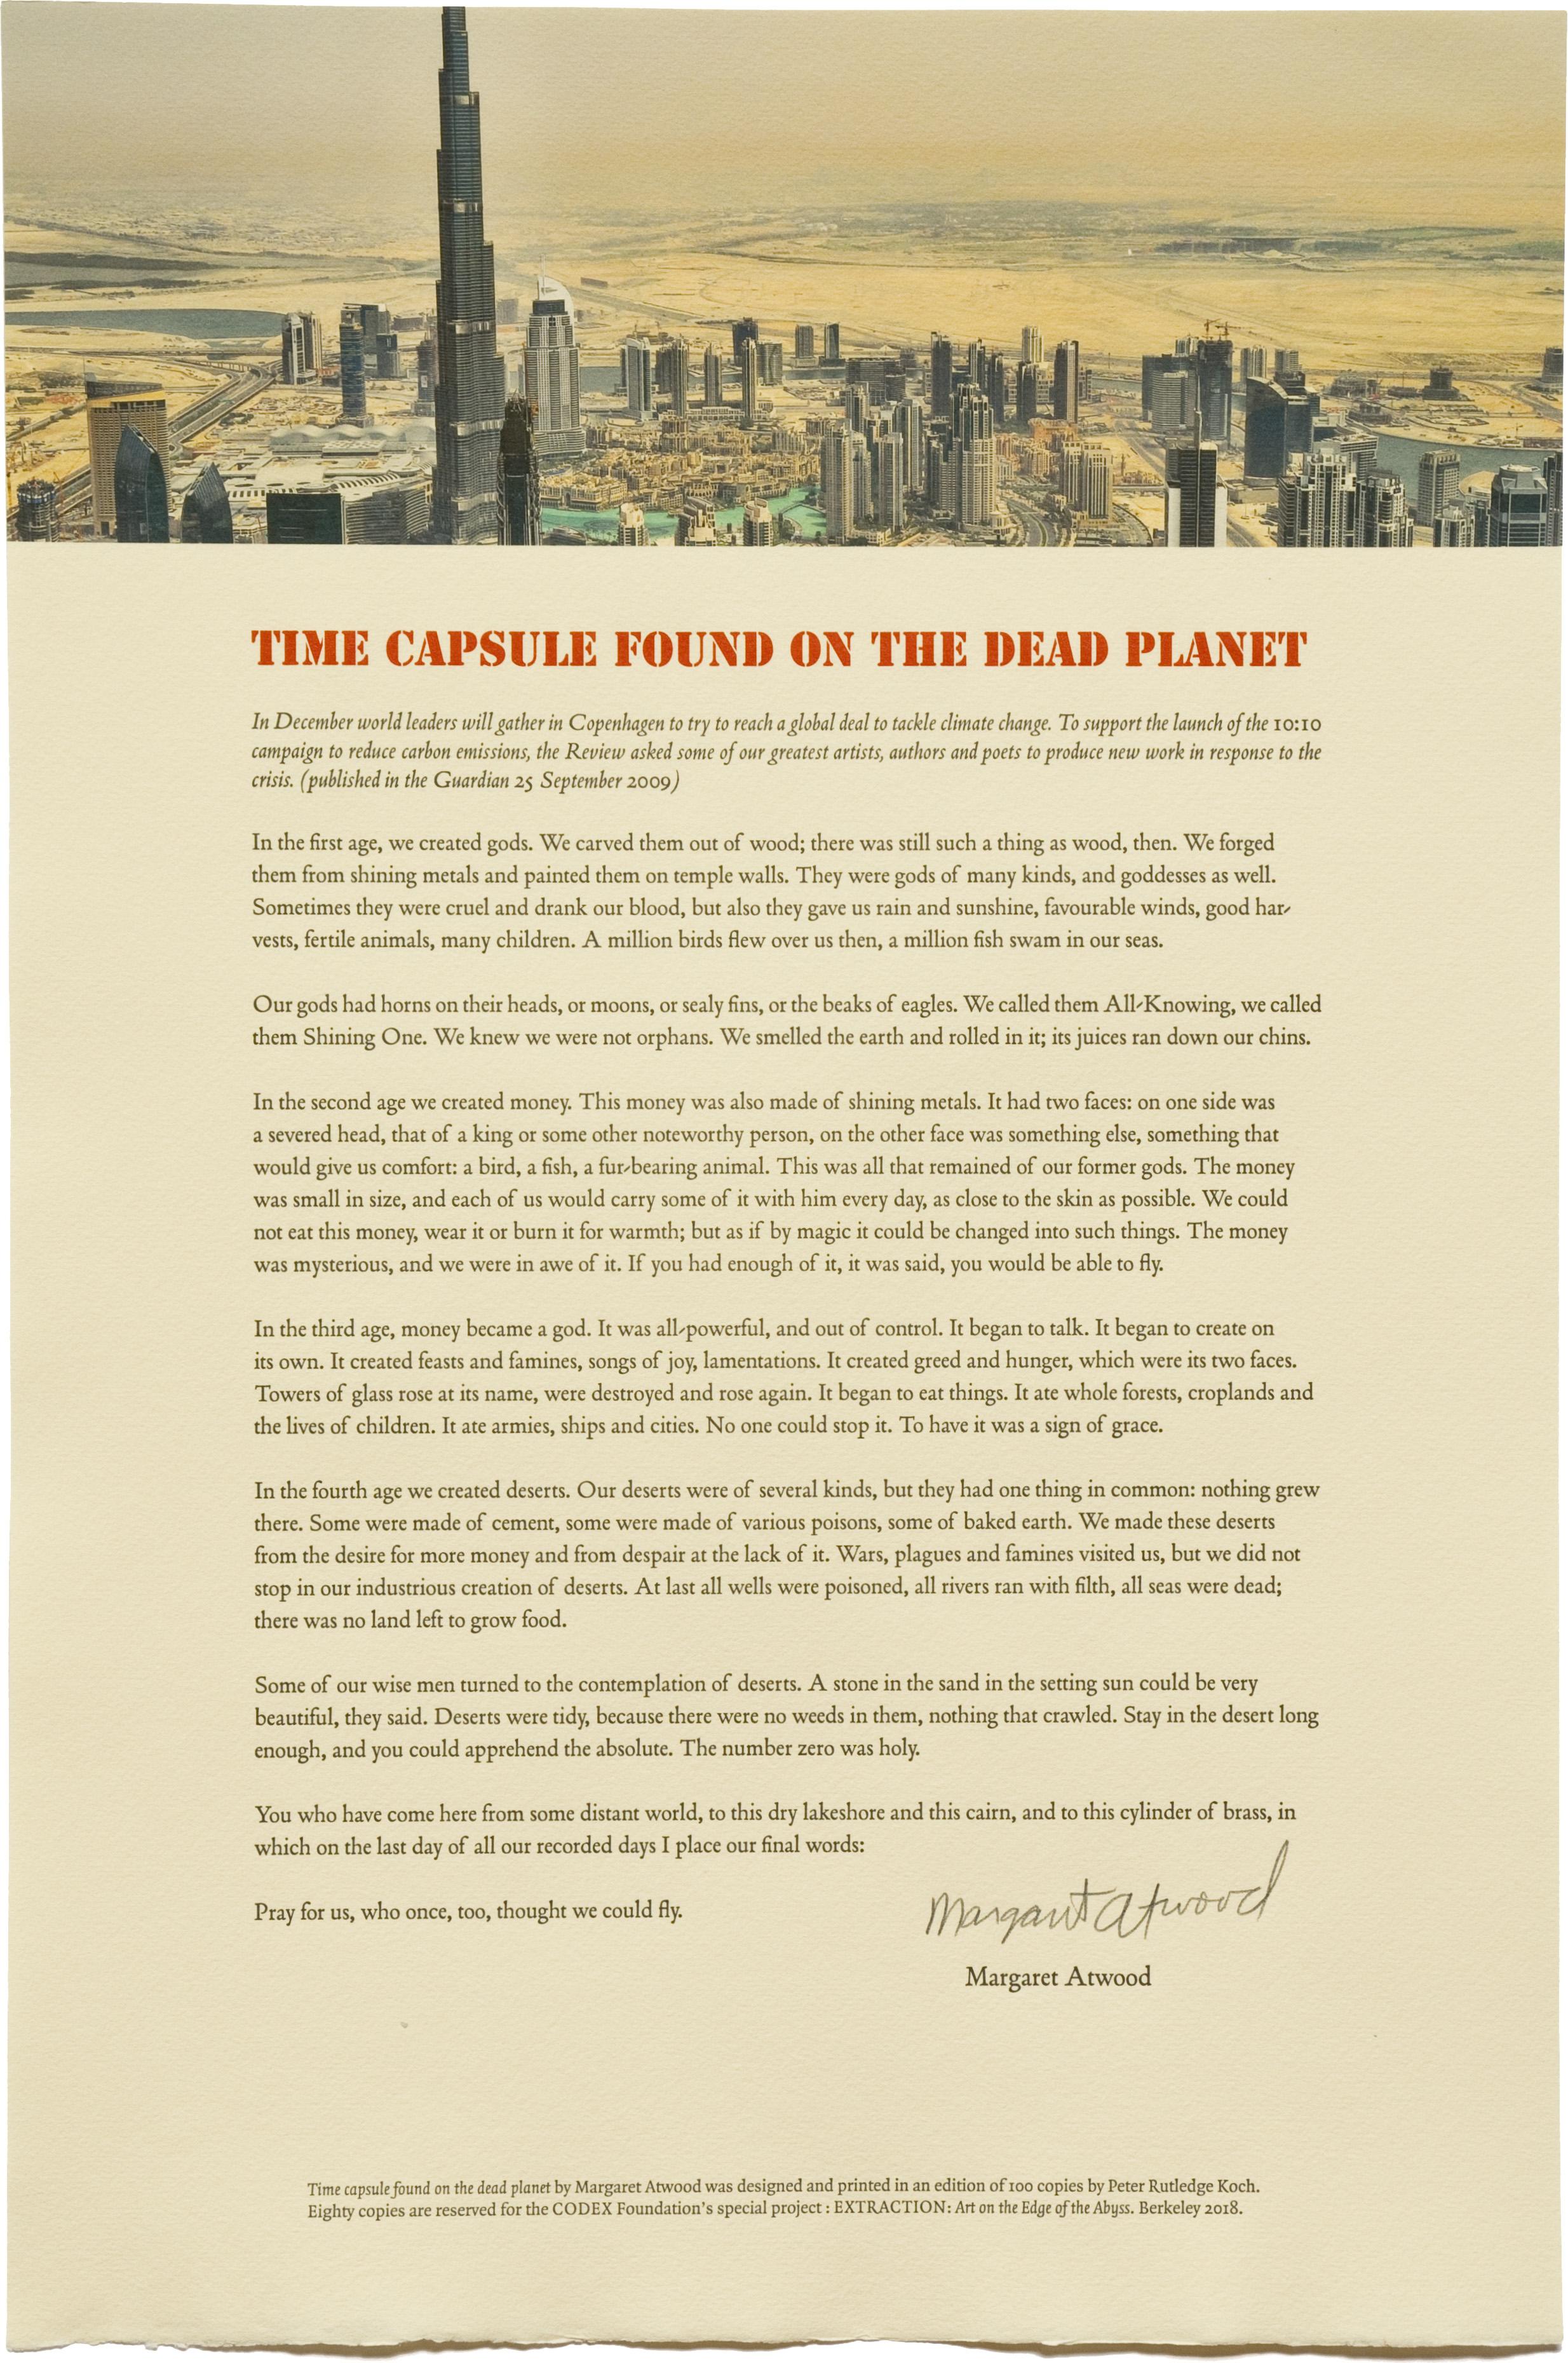 time capsule found copy.jpg